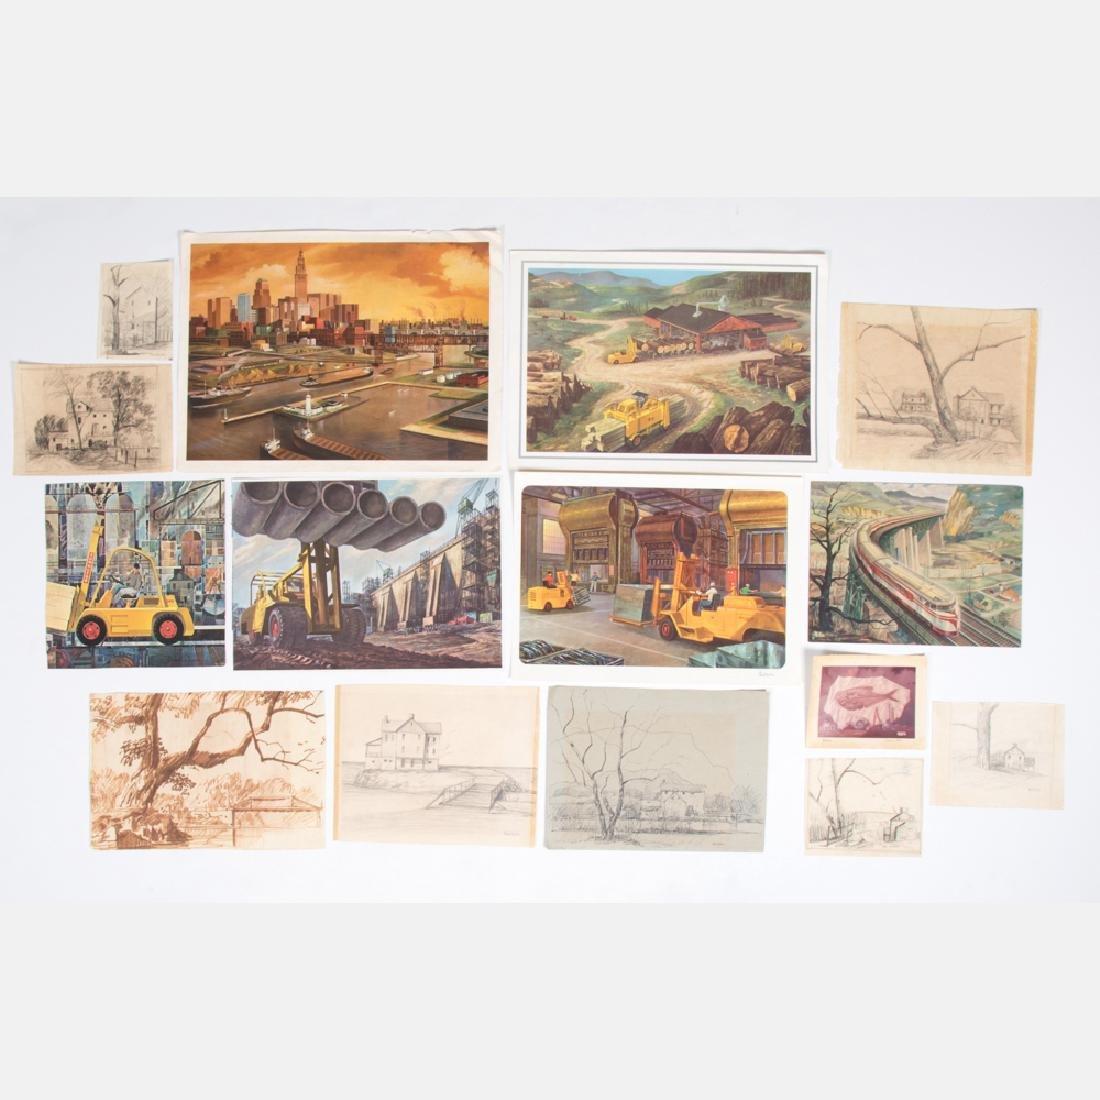 Paul Riba (1912-1977) A Group of Eight Studies, Pencil